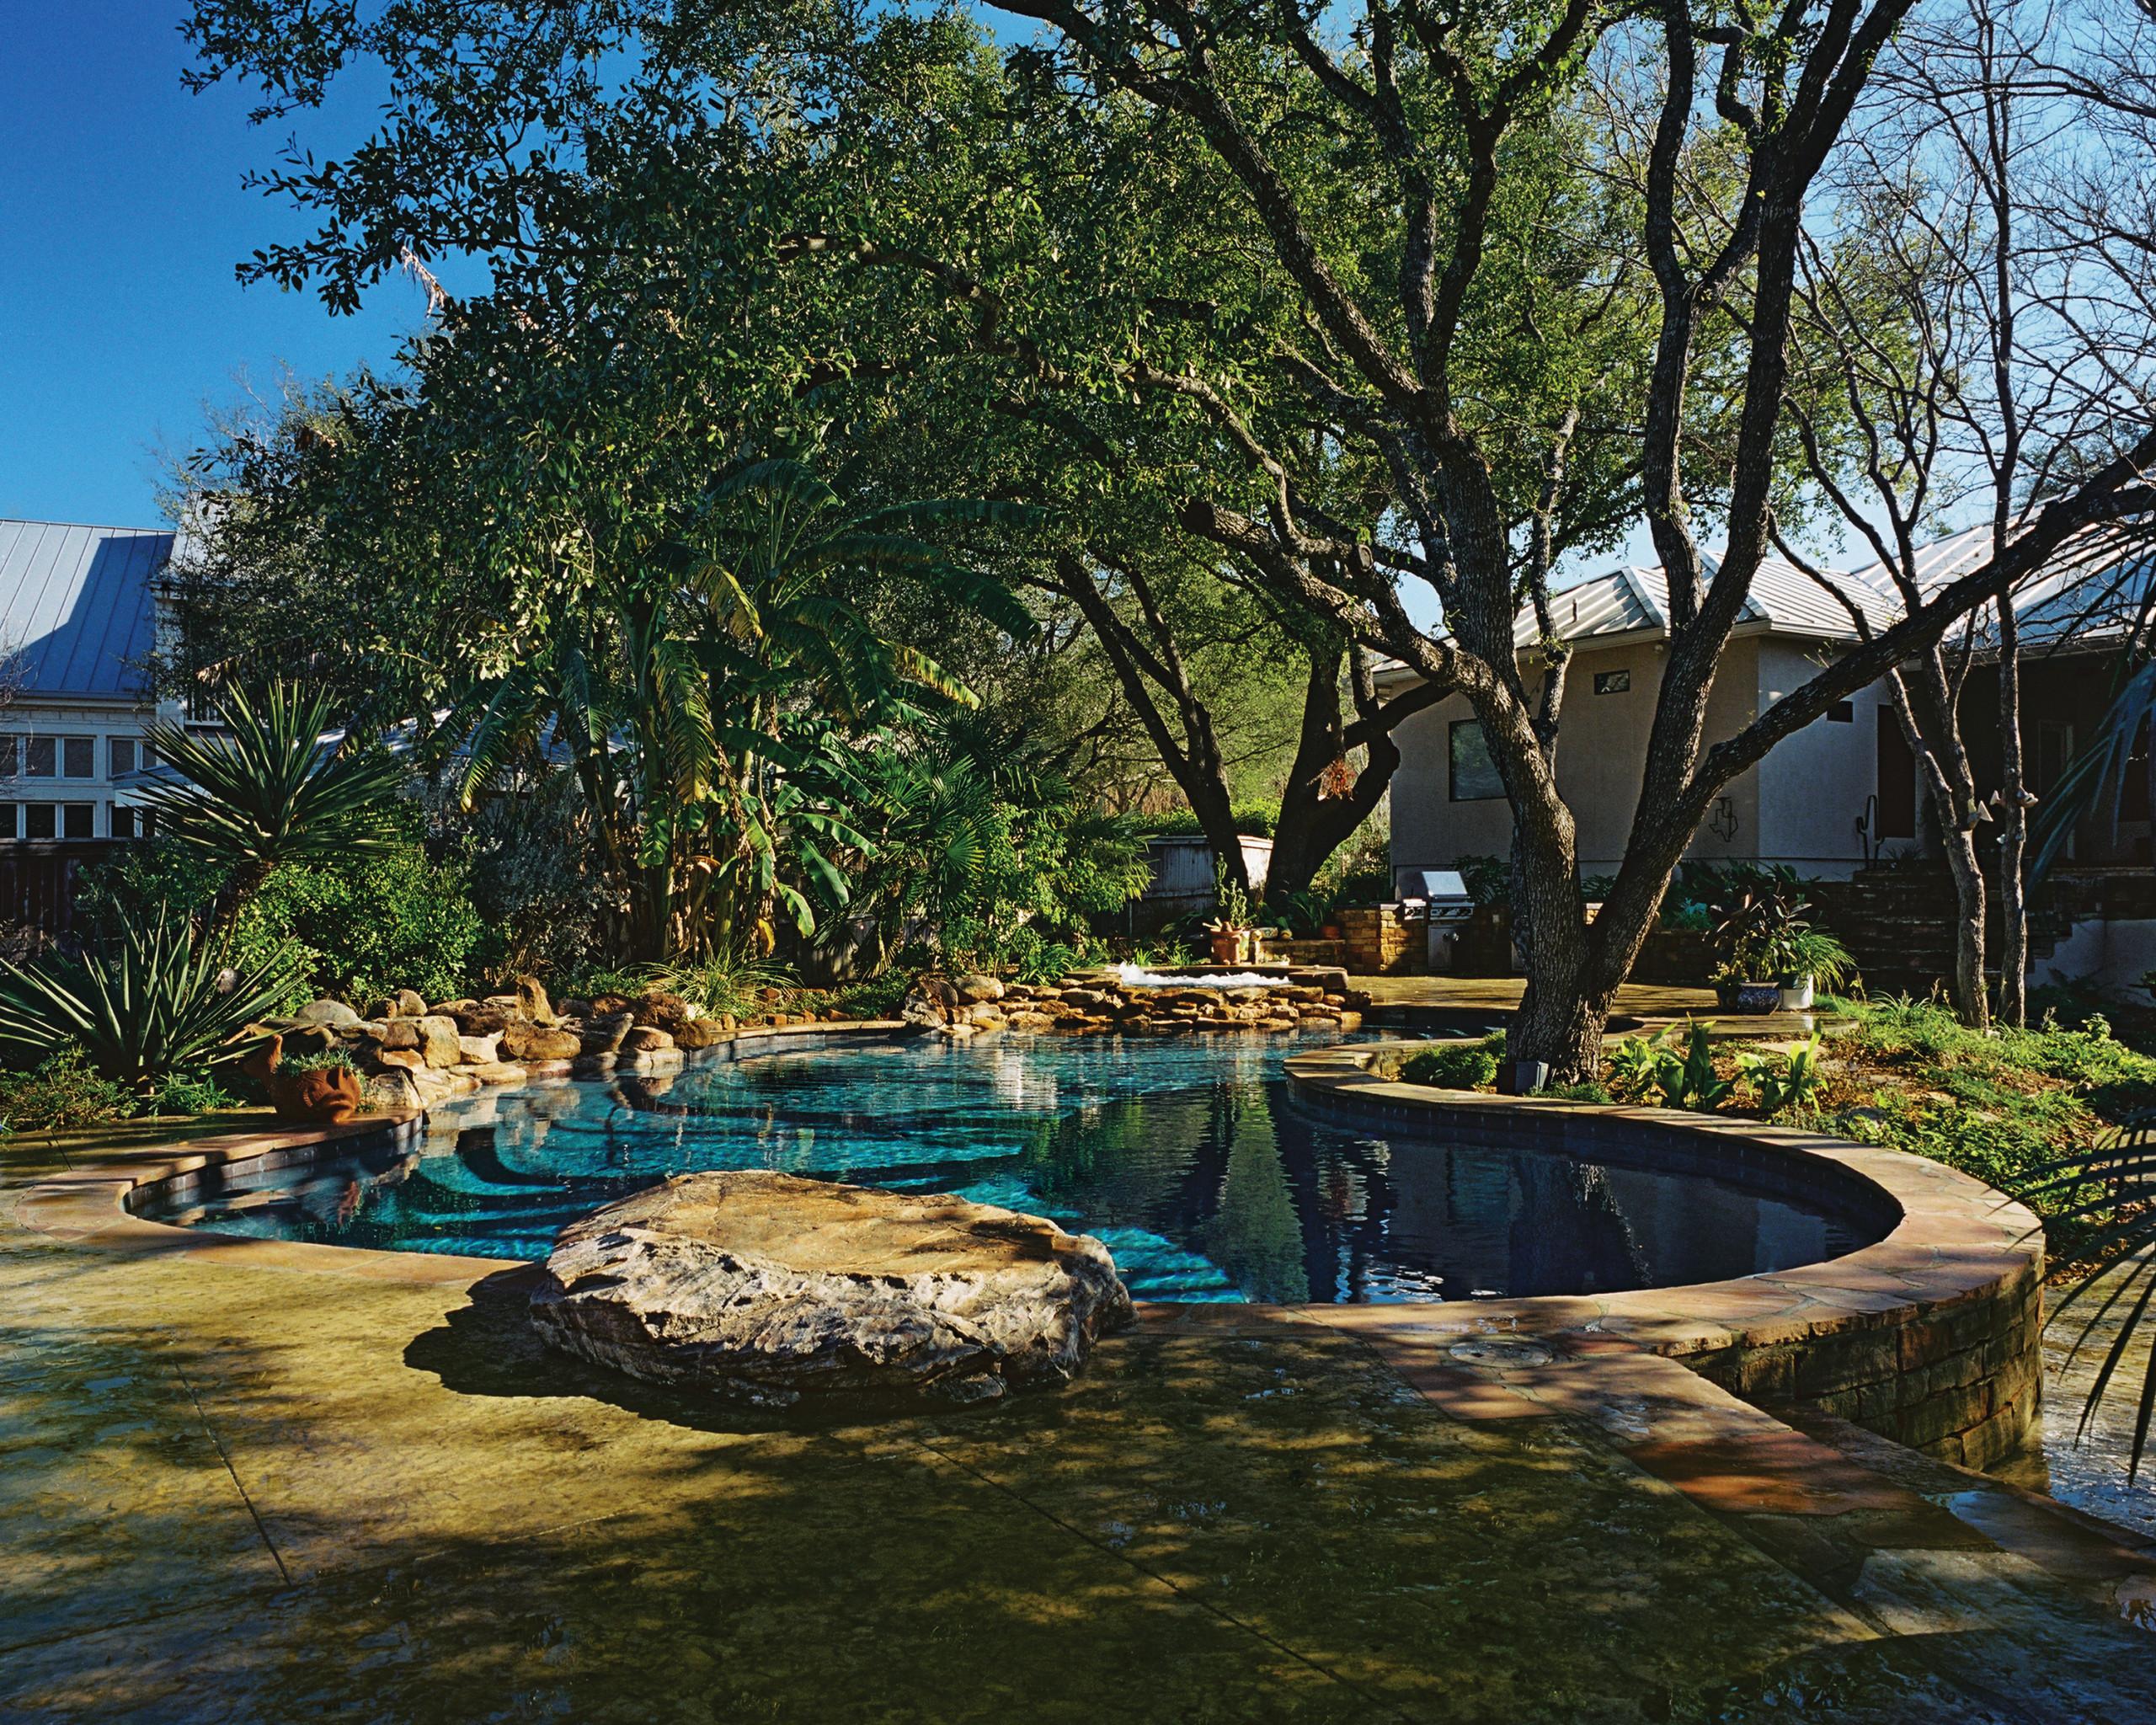 San Antonio, Texas Natural Pool/Spa/Waterfall/Outdoor Living